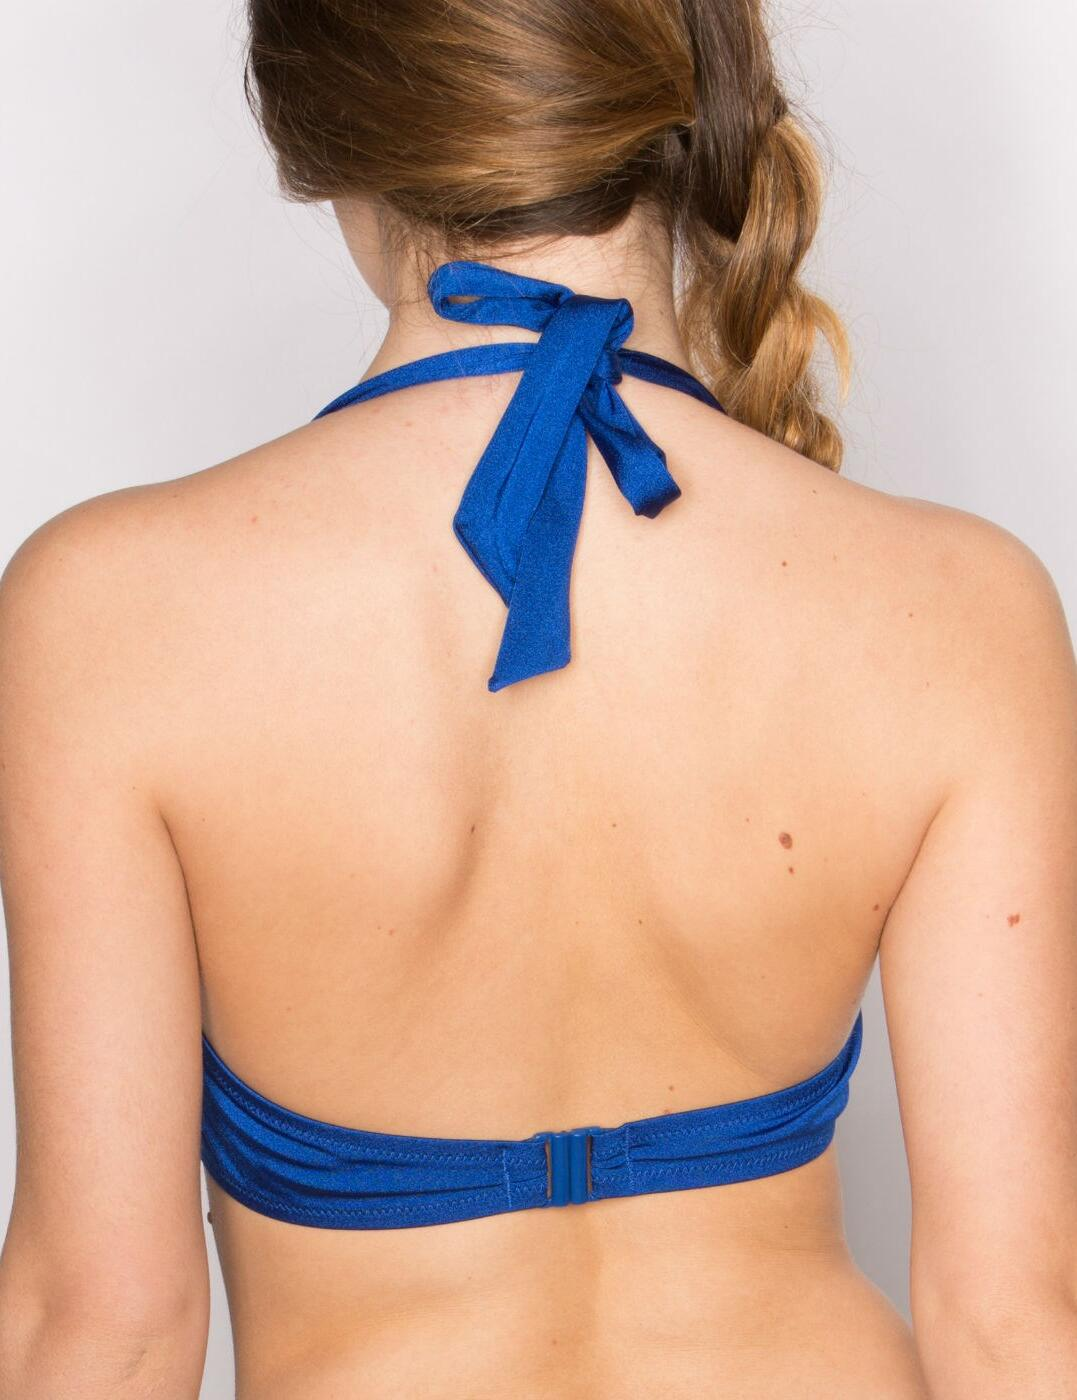 27000 Pour Moi? Bahamas Padded Halter Bikini Top  - 27000 Blue/Aqua